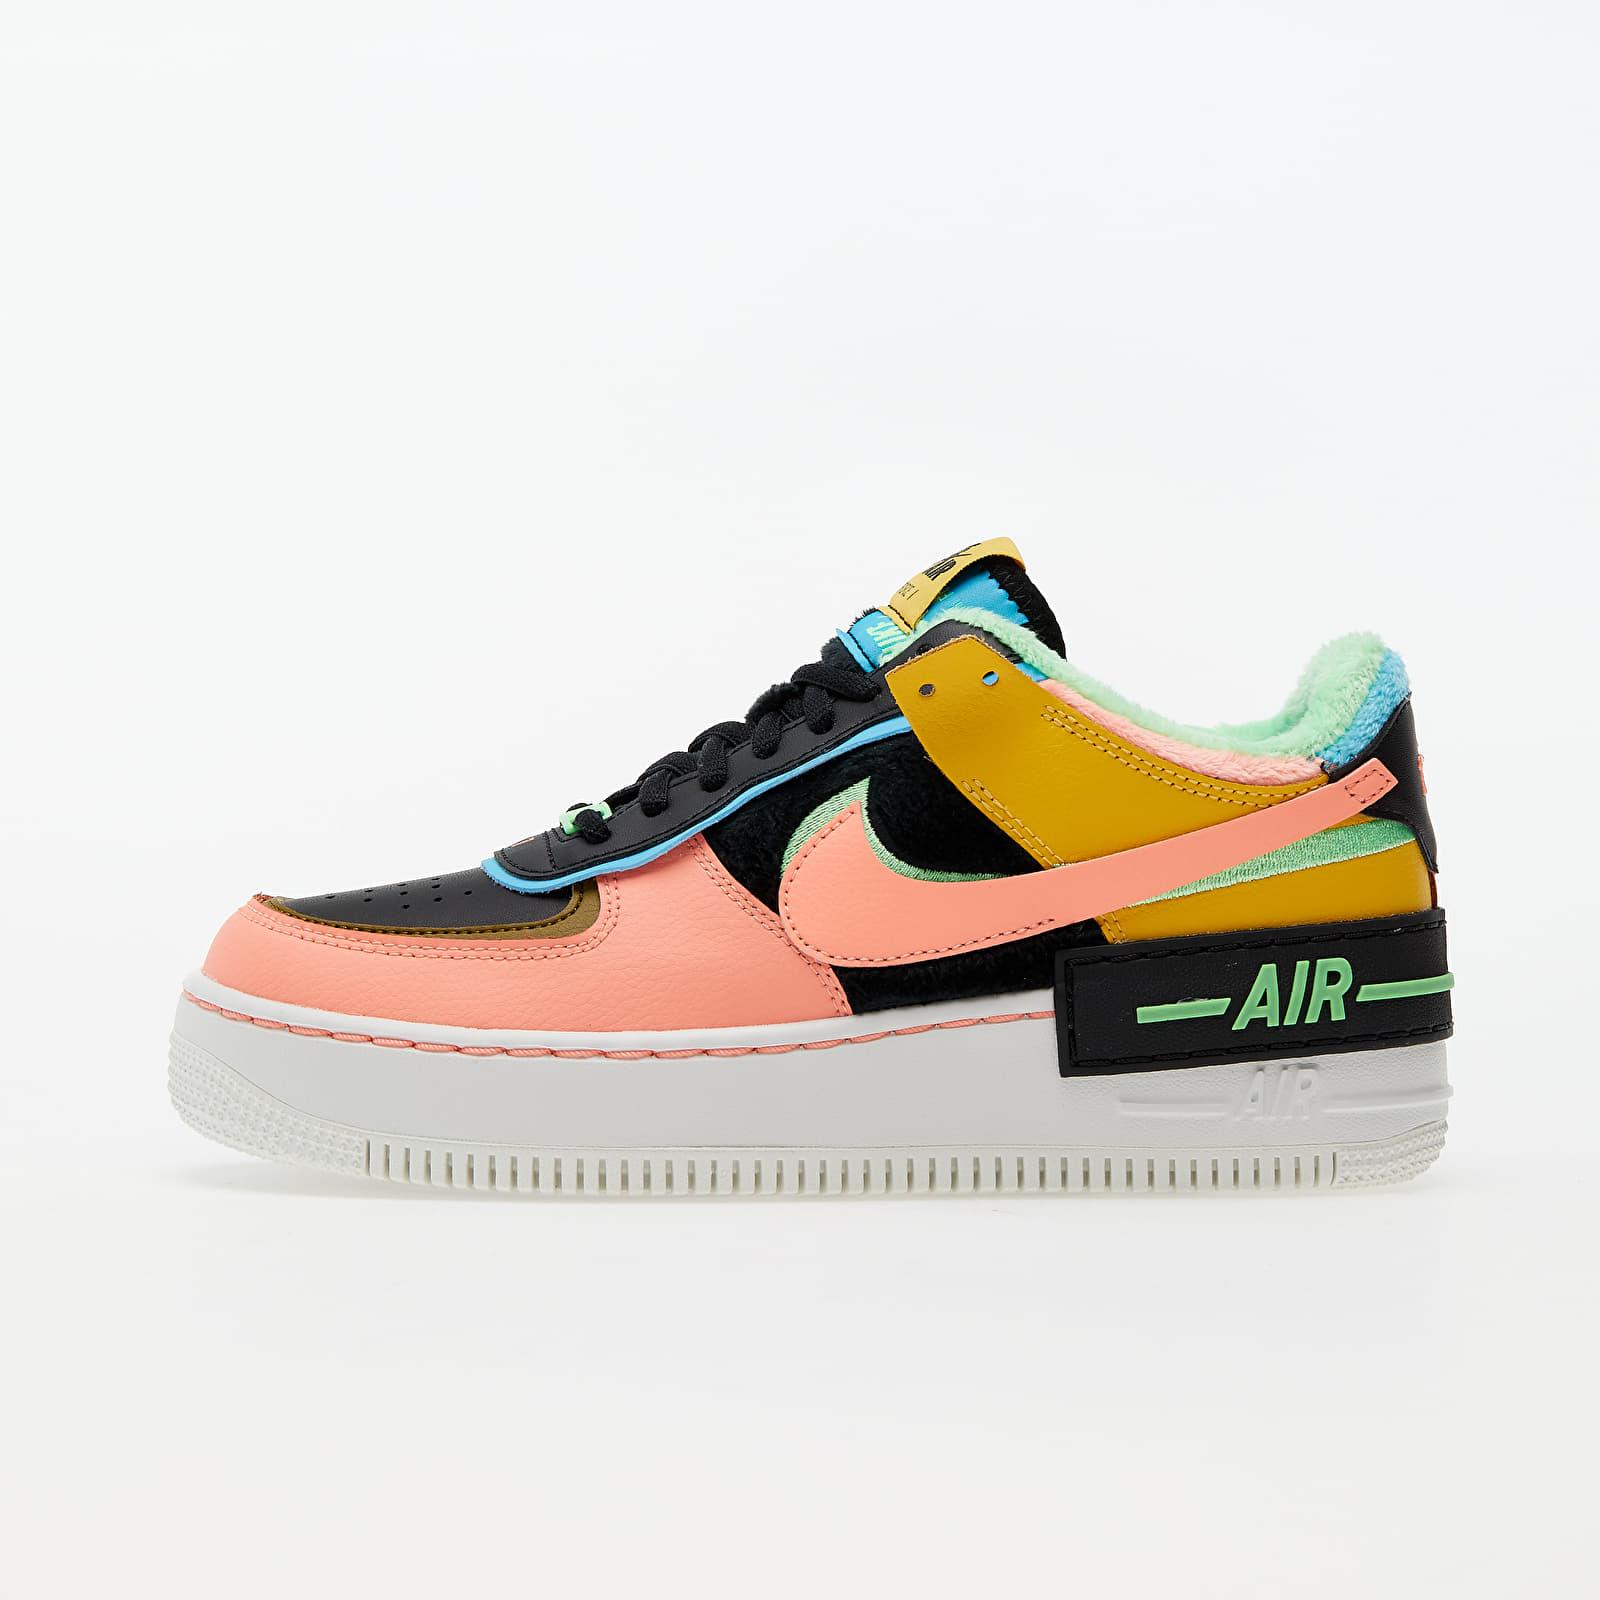 air force 1 la flare